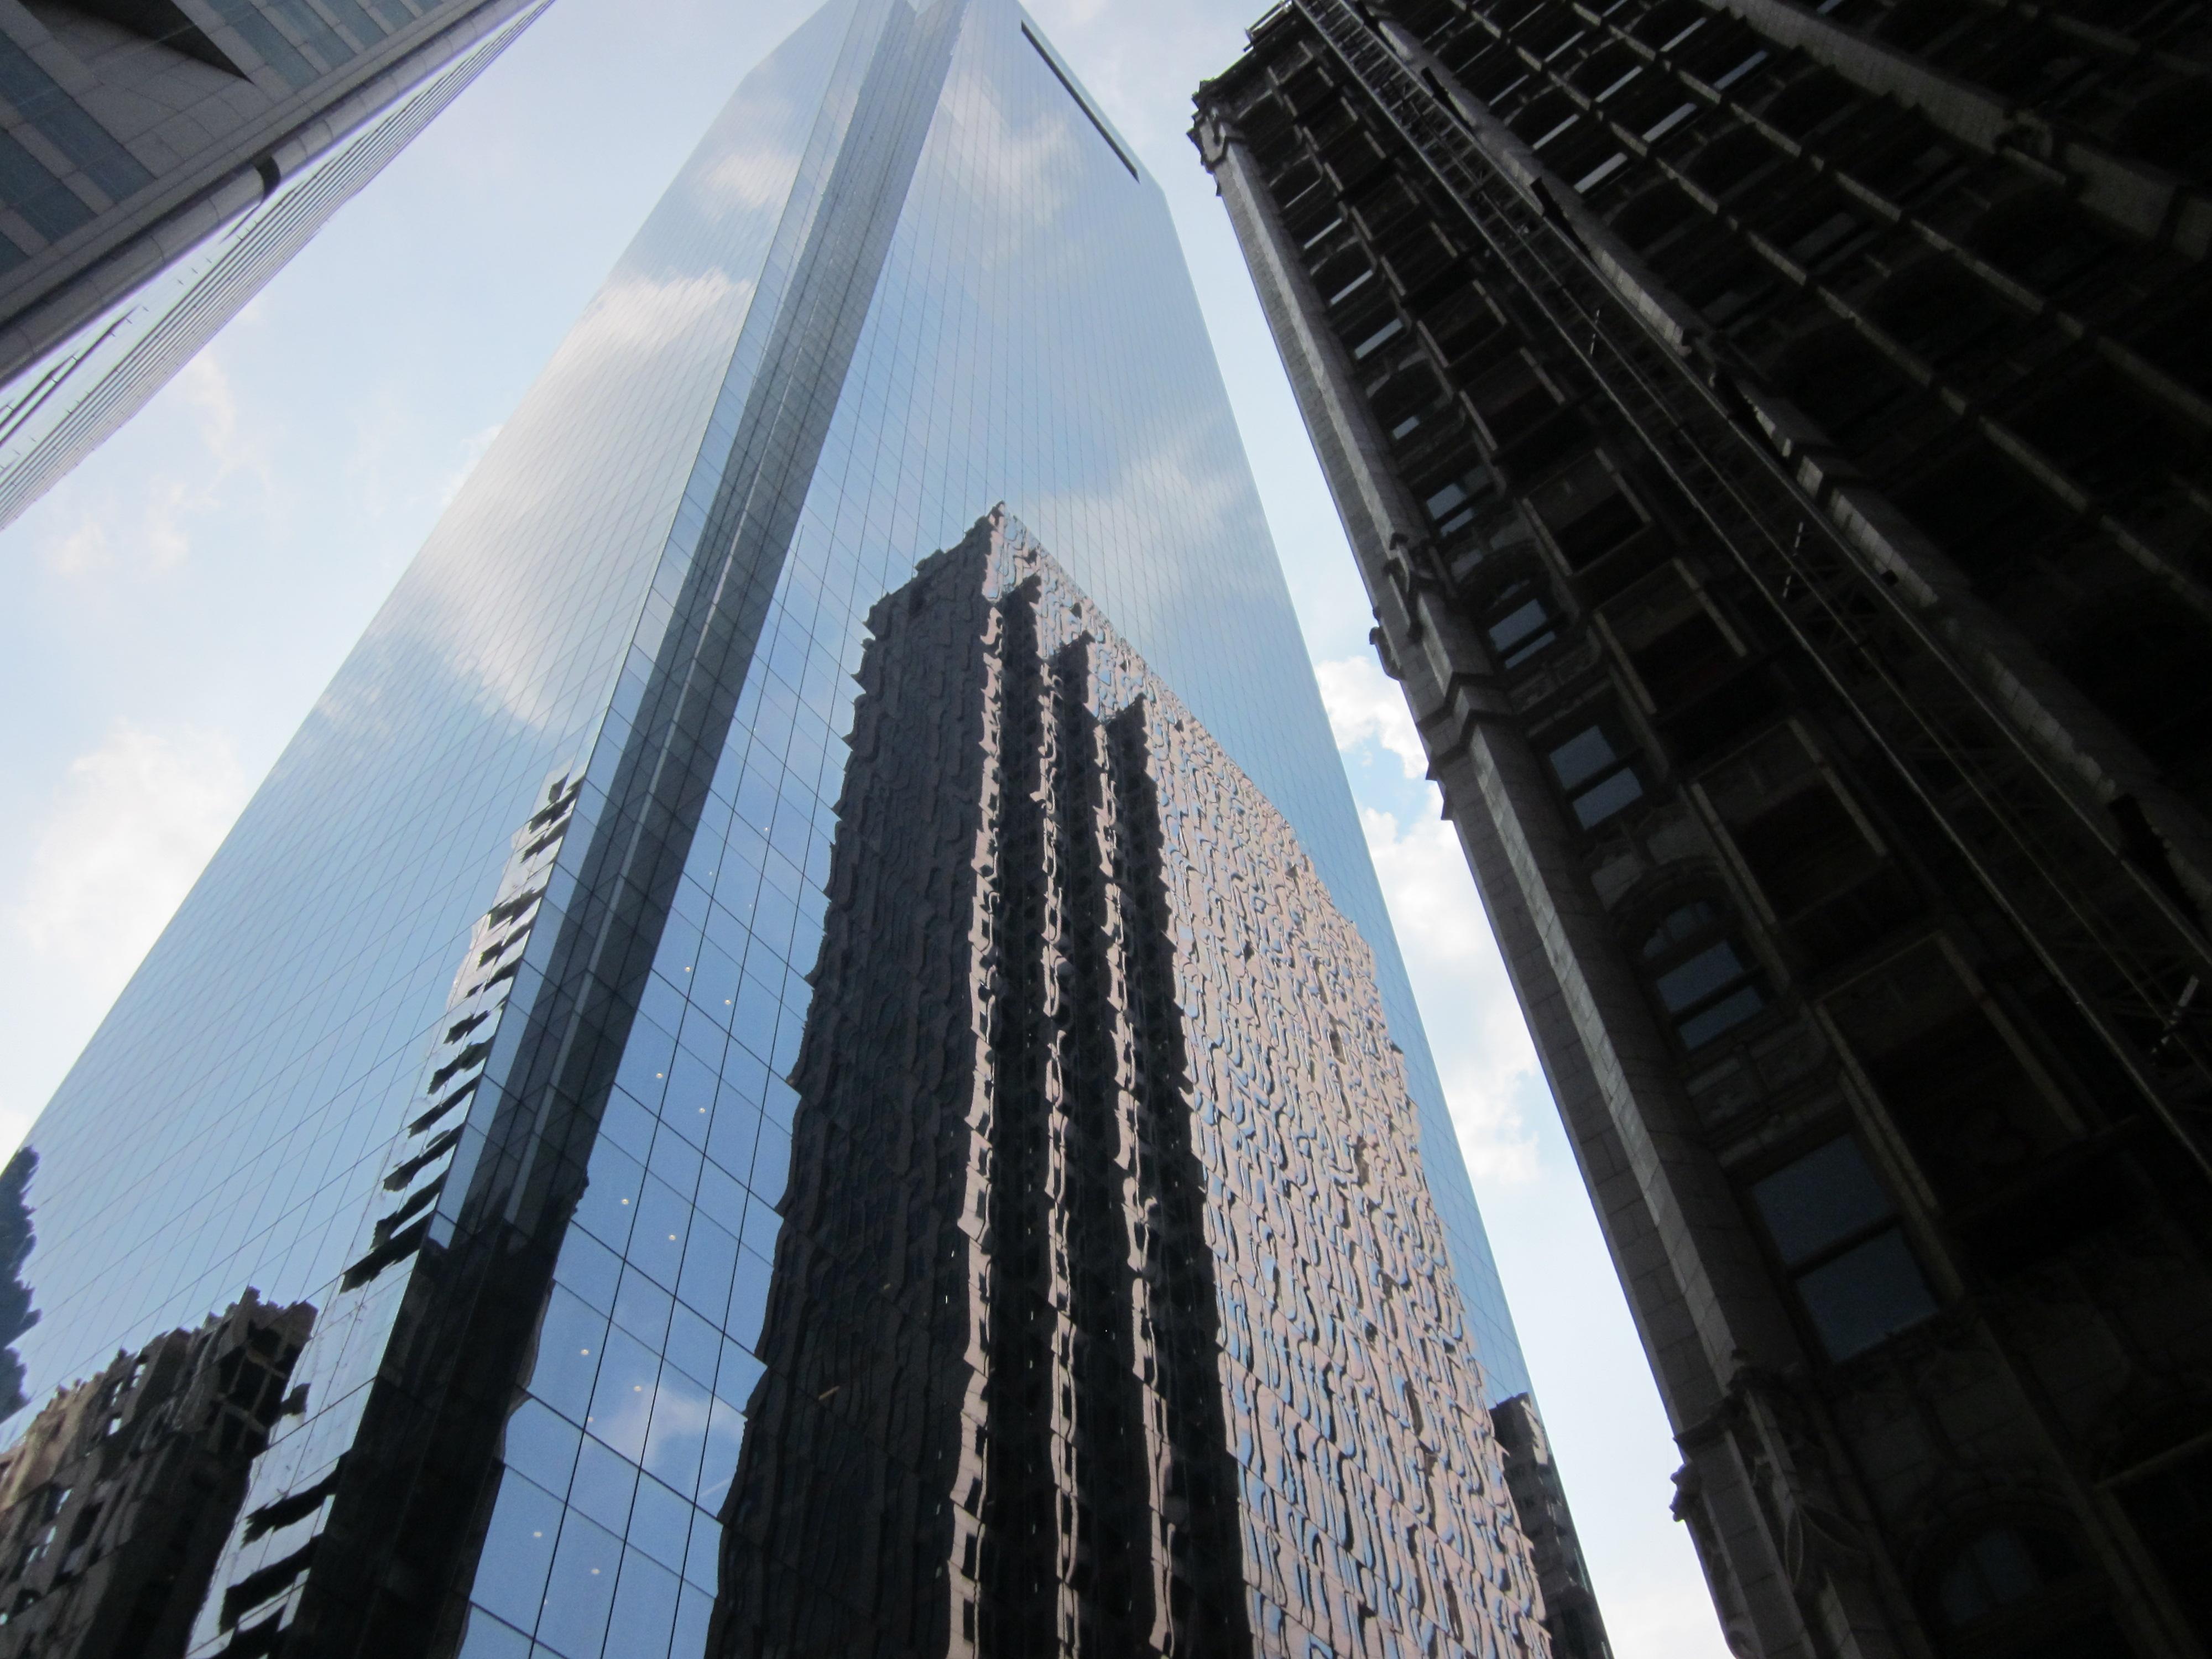 Architectural Contrast Robert Morris Building Across